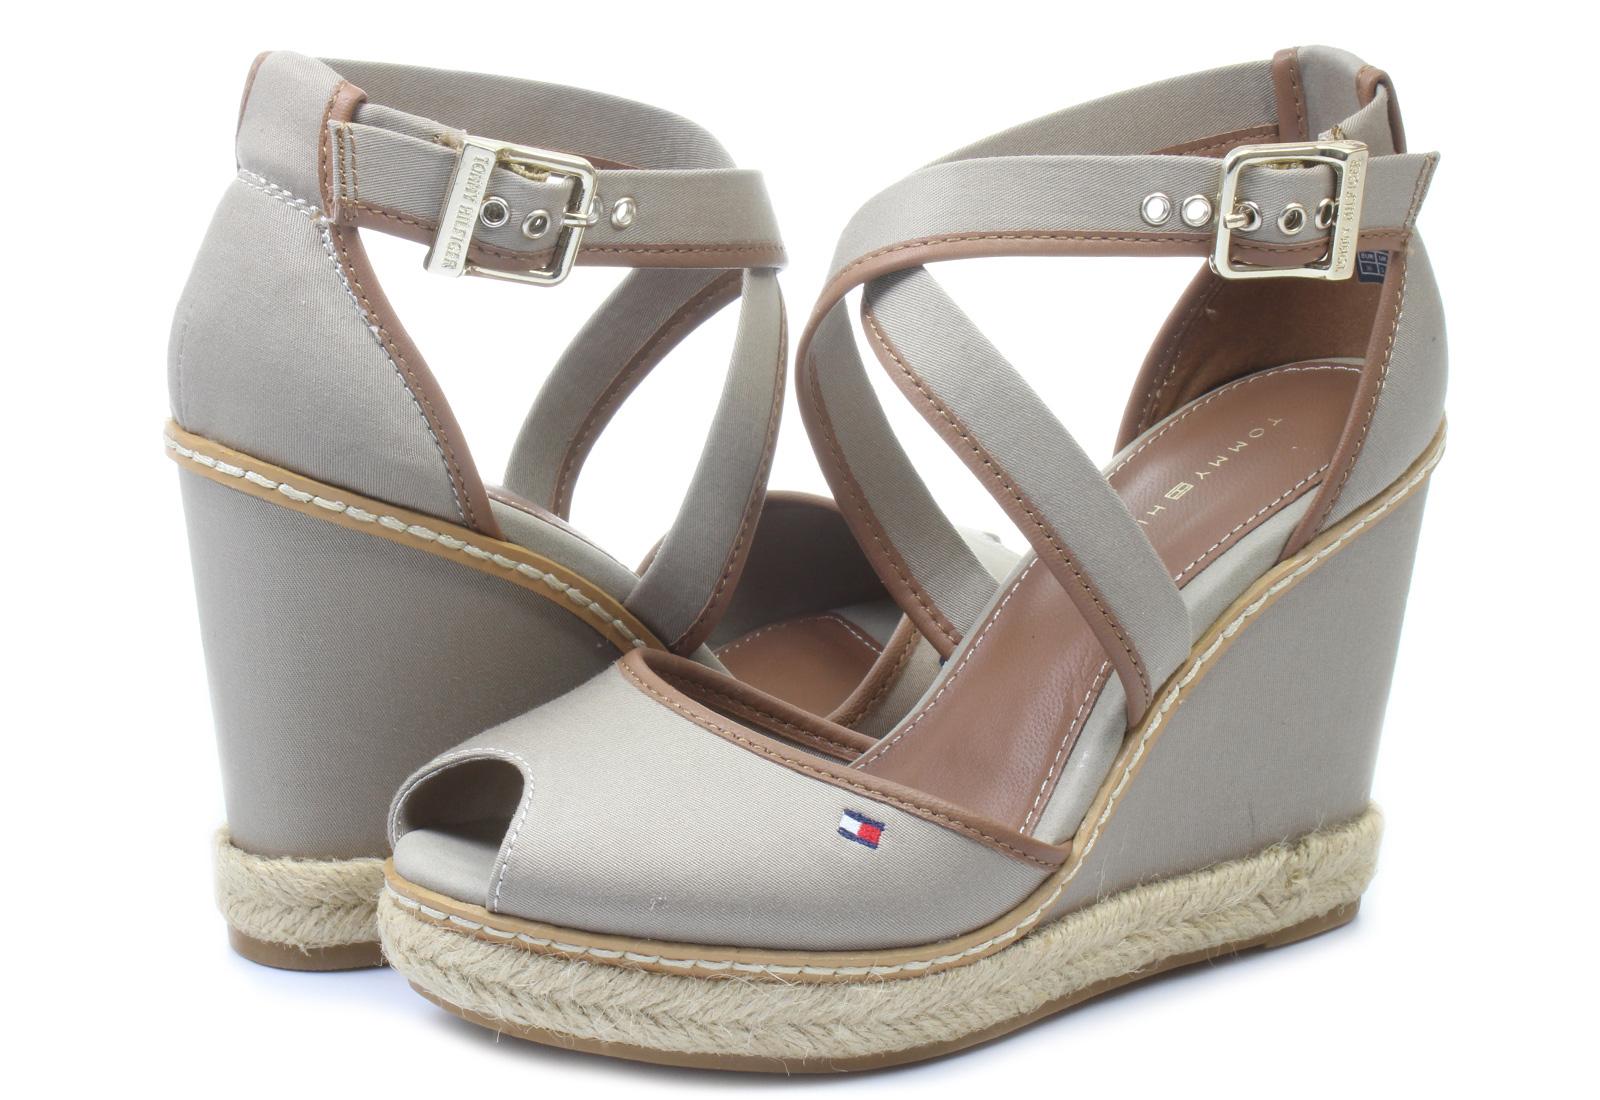 3ba6886d4fe57 Tommy Hilfiger Sandale - Emery 50d - 14S-6768-007 - Office Shoes Romania